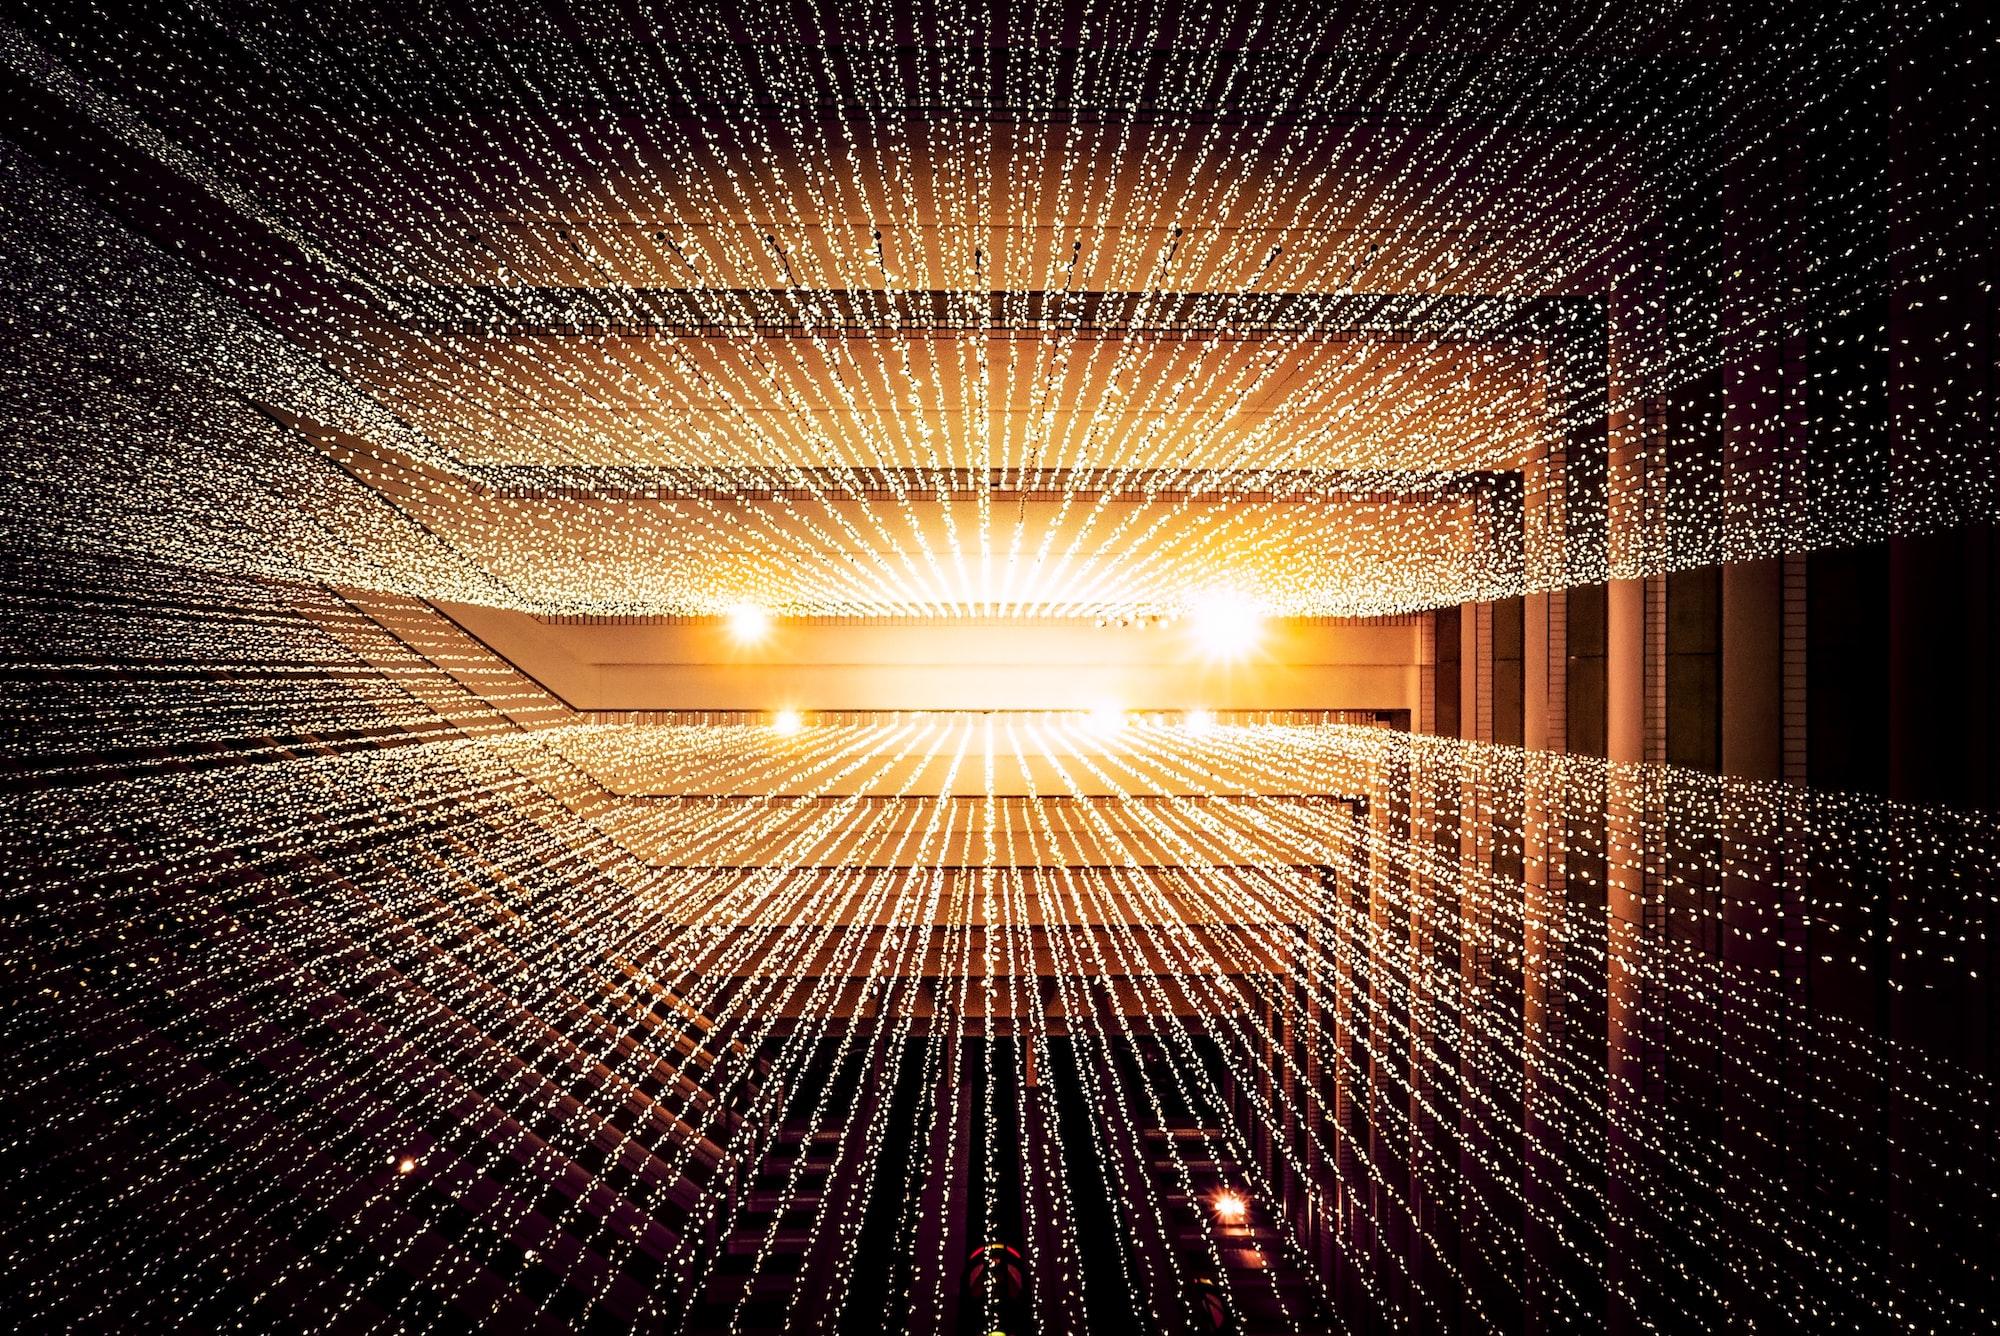 Future predictions for IoT sensor technologies